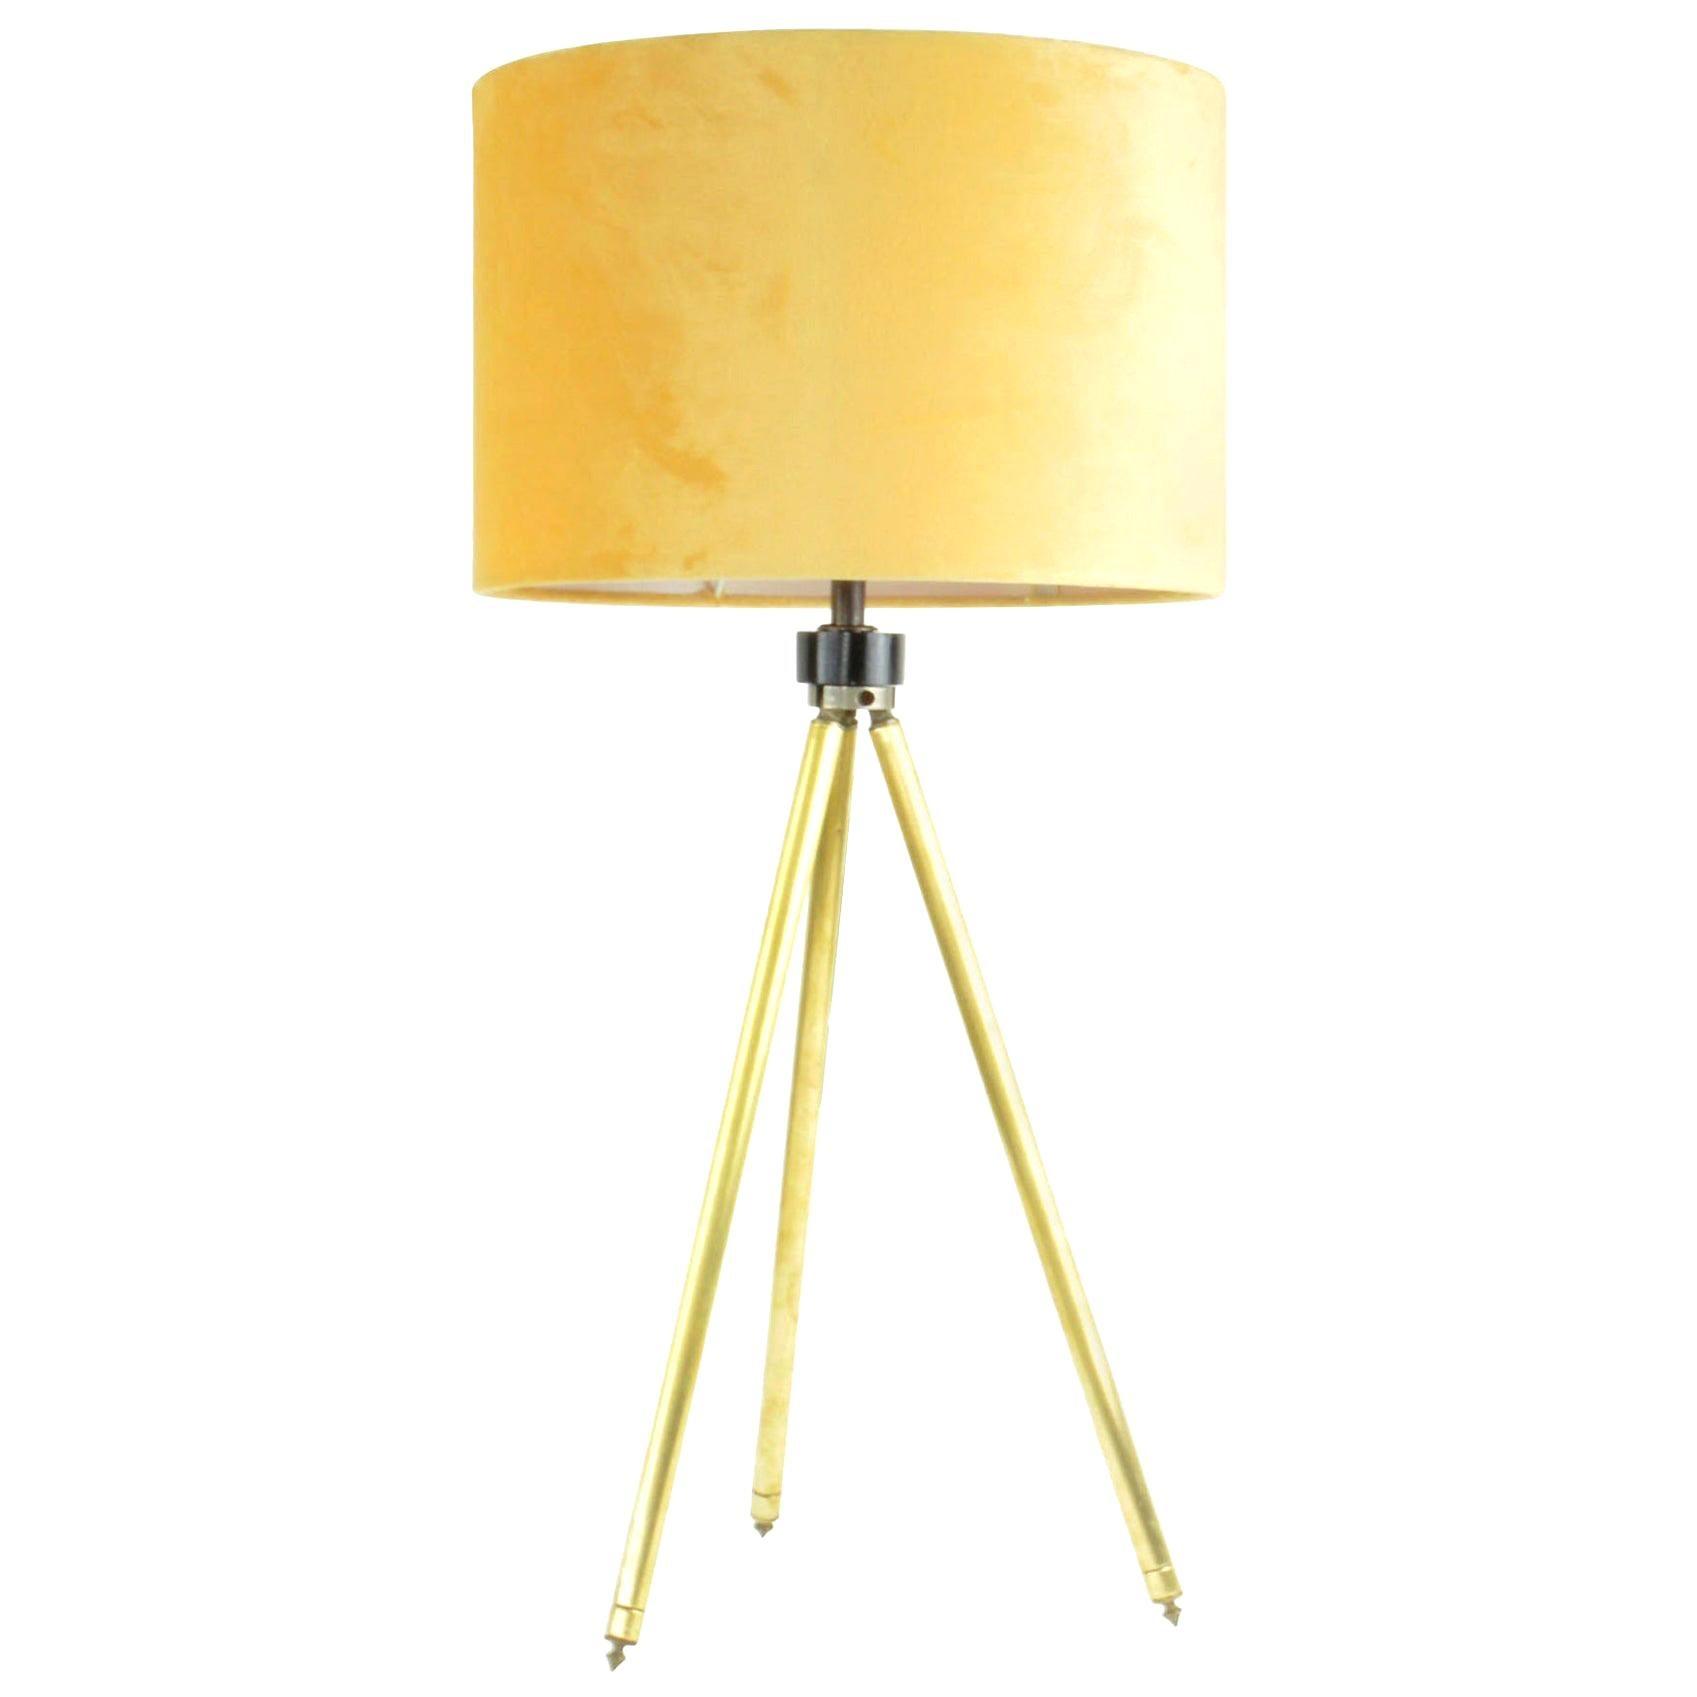 Midcentury Brass Telescopic Tripod Table Lamp